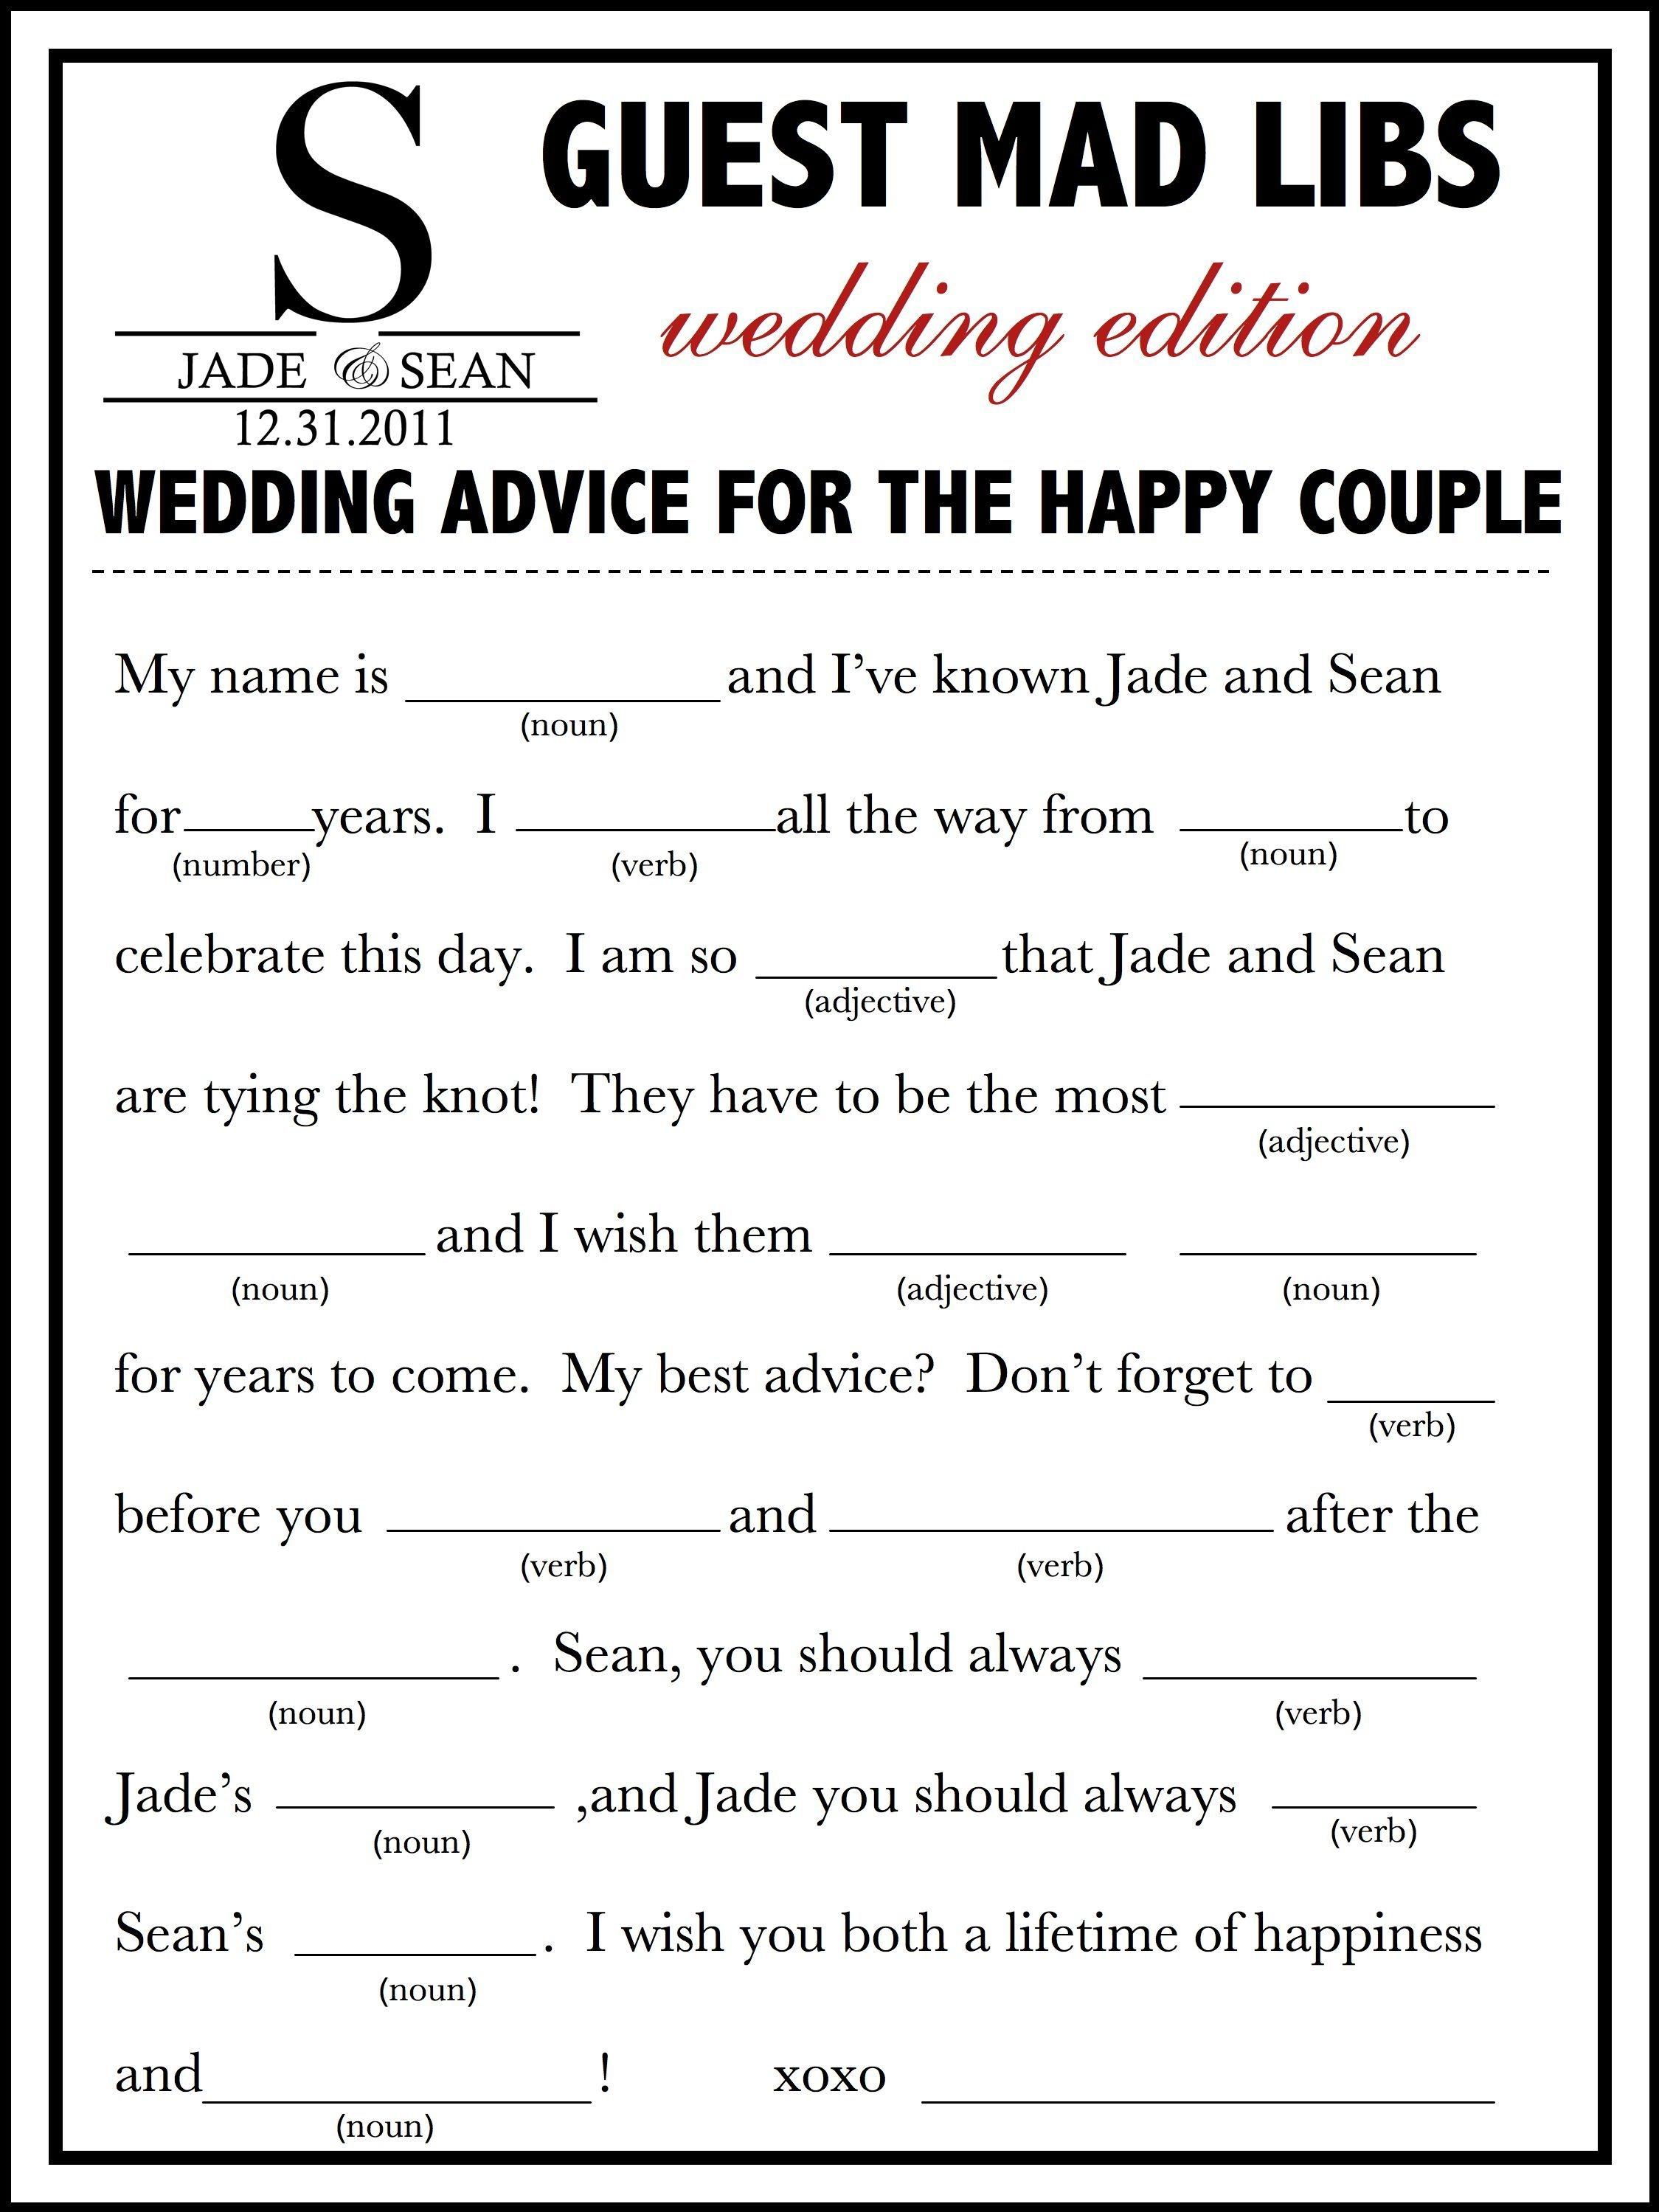 Wedding Mad Libs Template Free   Fun Unique Guest Book Alternative - Free Printable Wedding Mad Libs